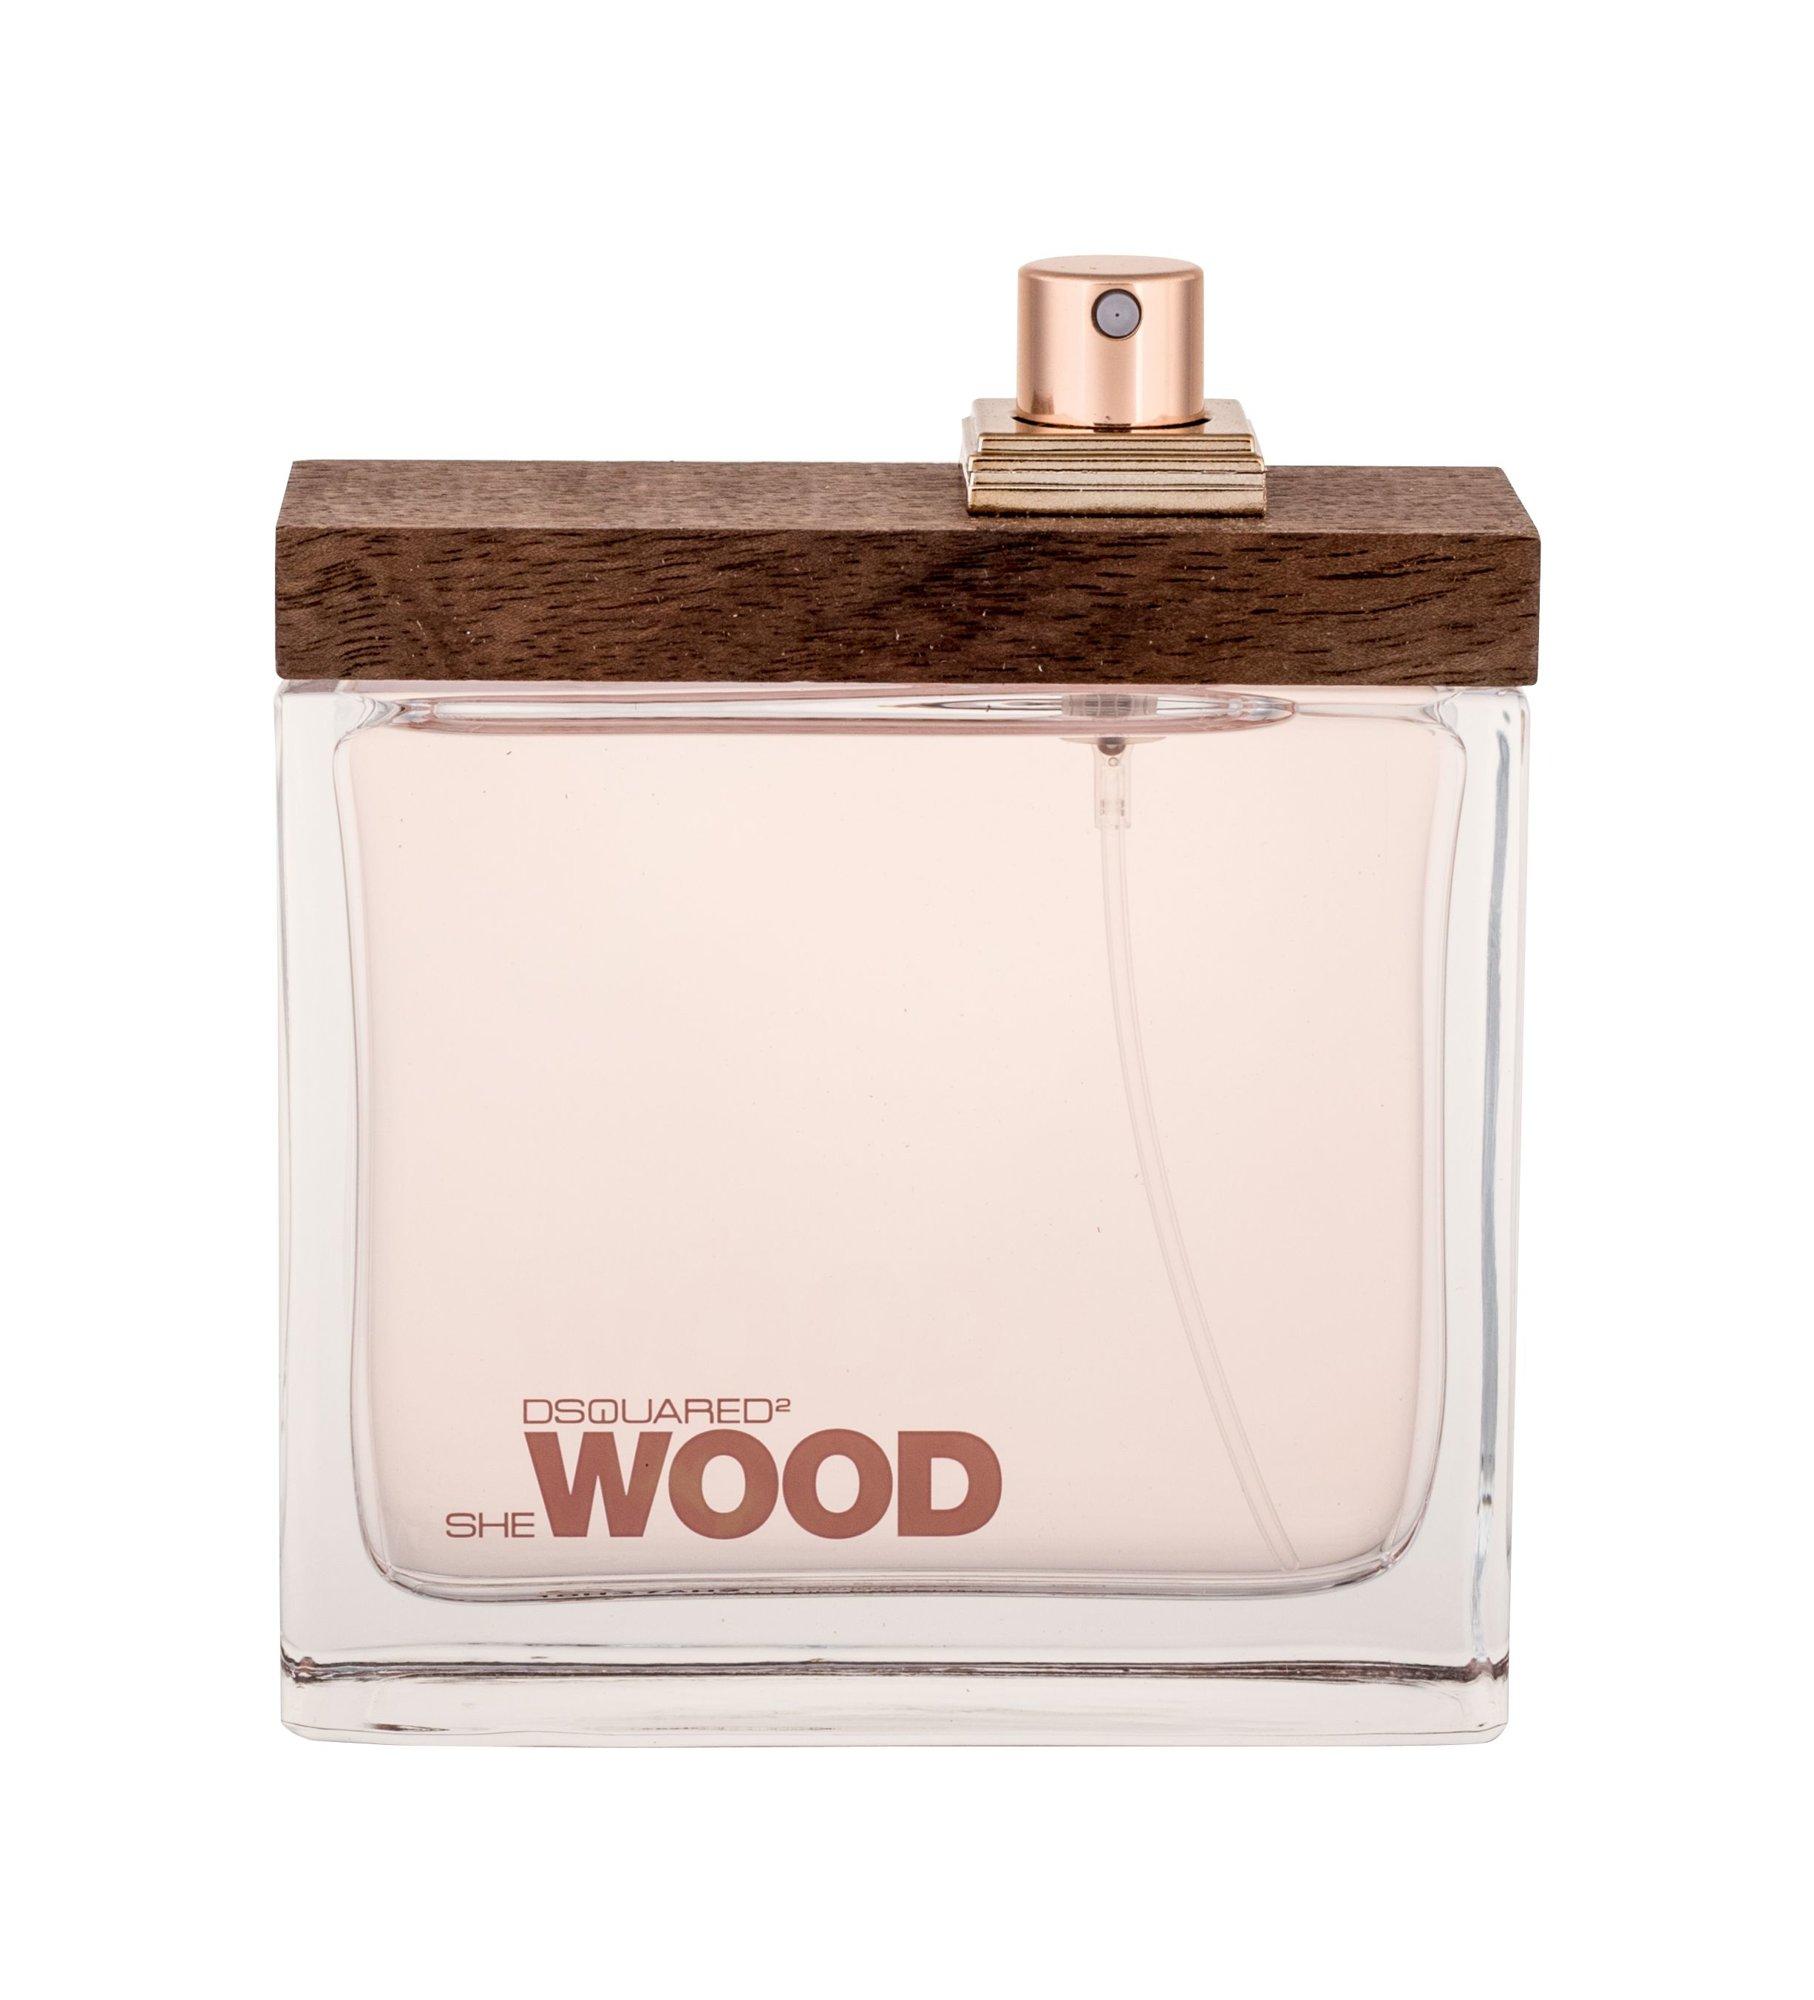 Dsquared2 She Wood EDP 100ml